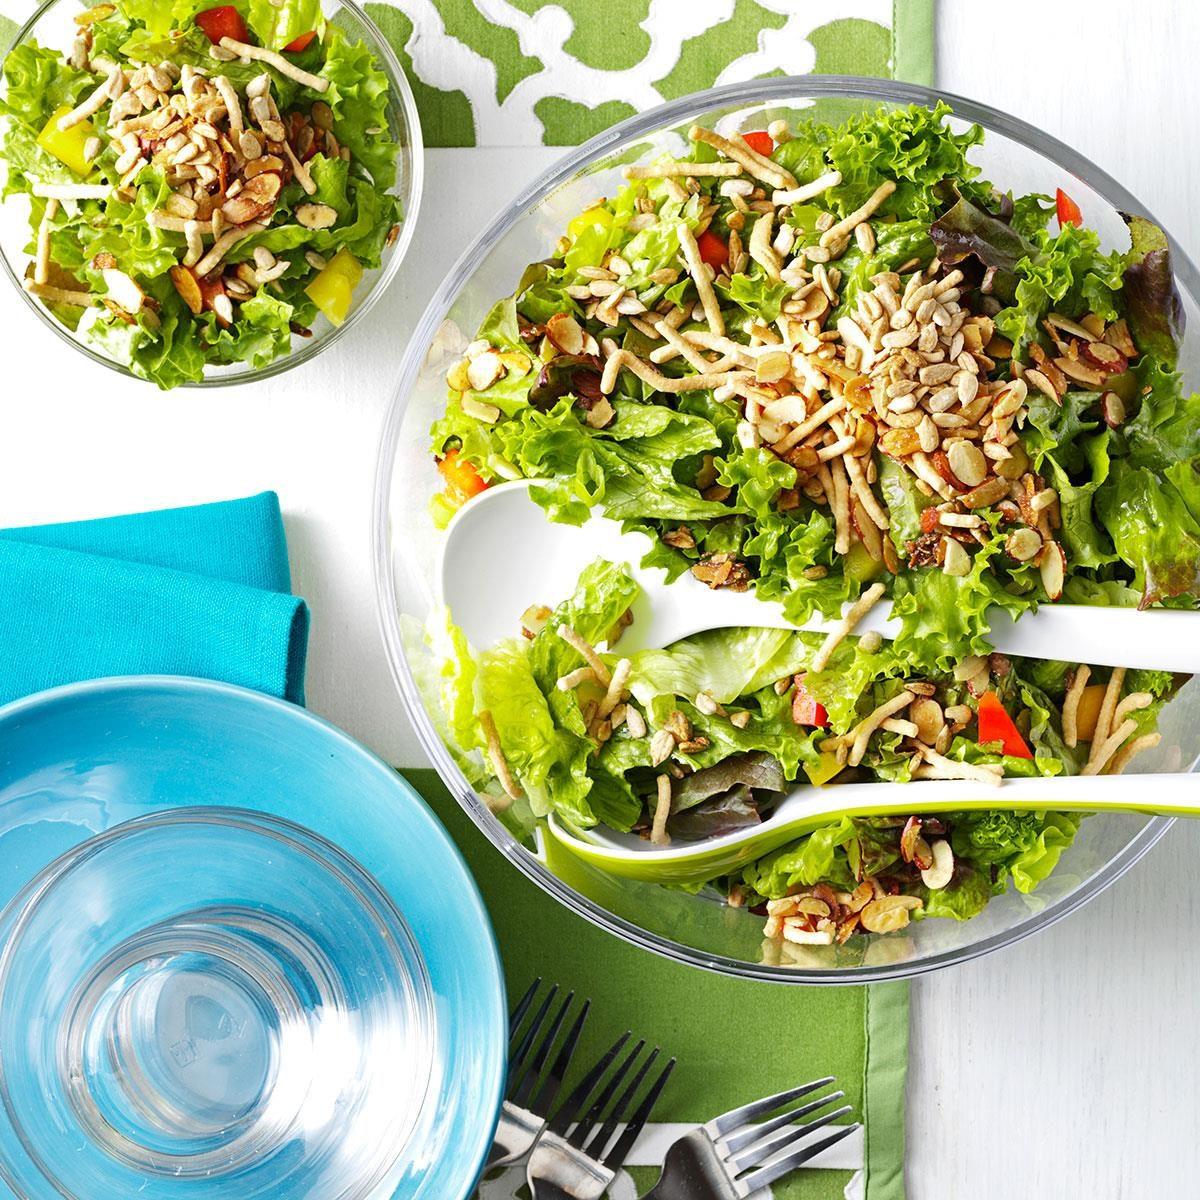 Company Green Salad